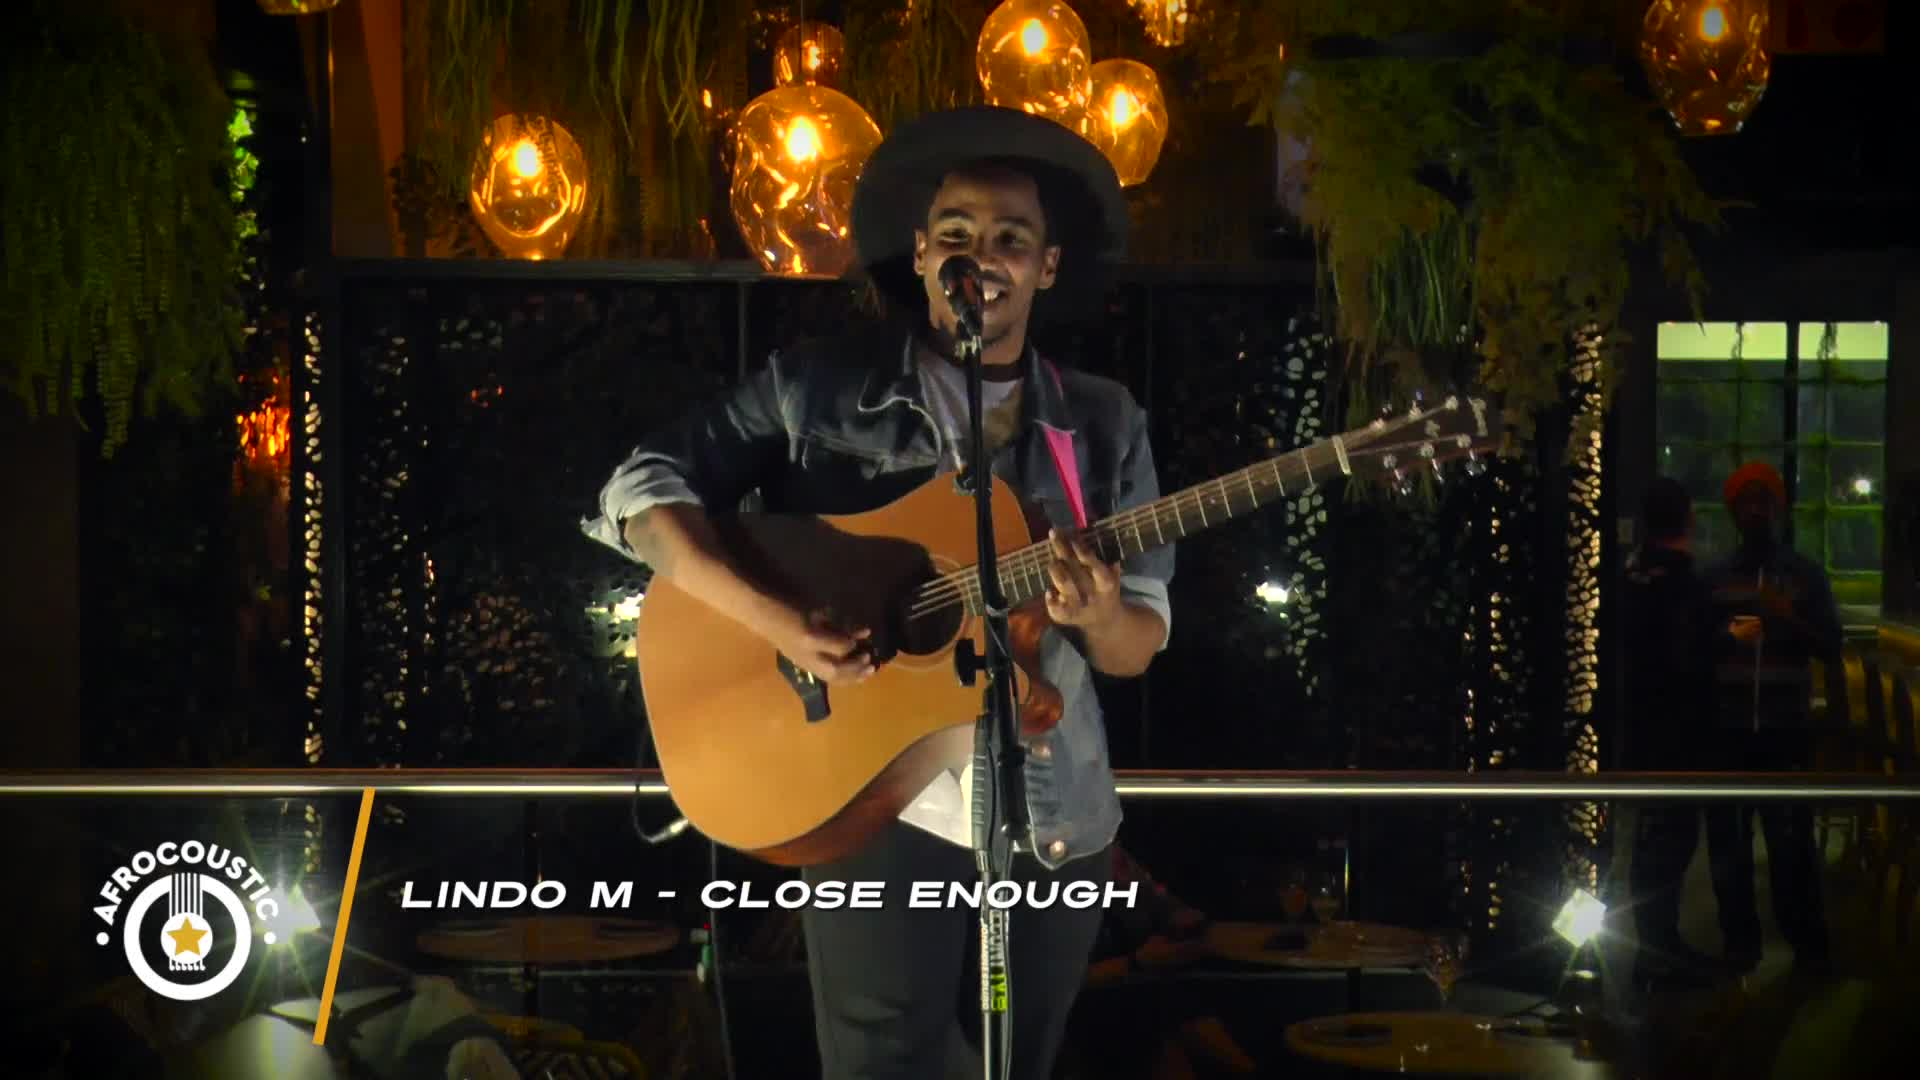 Afrocoustic - Lindo M - Close Enough